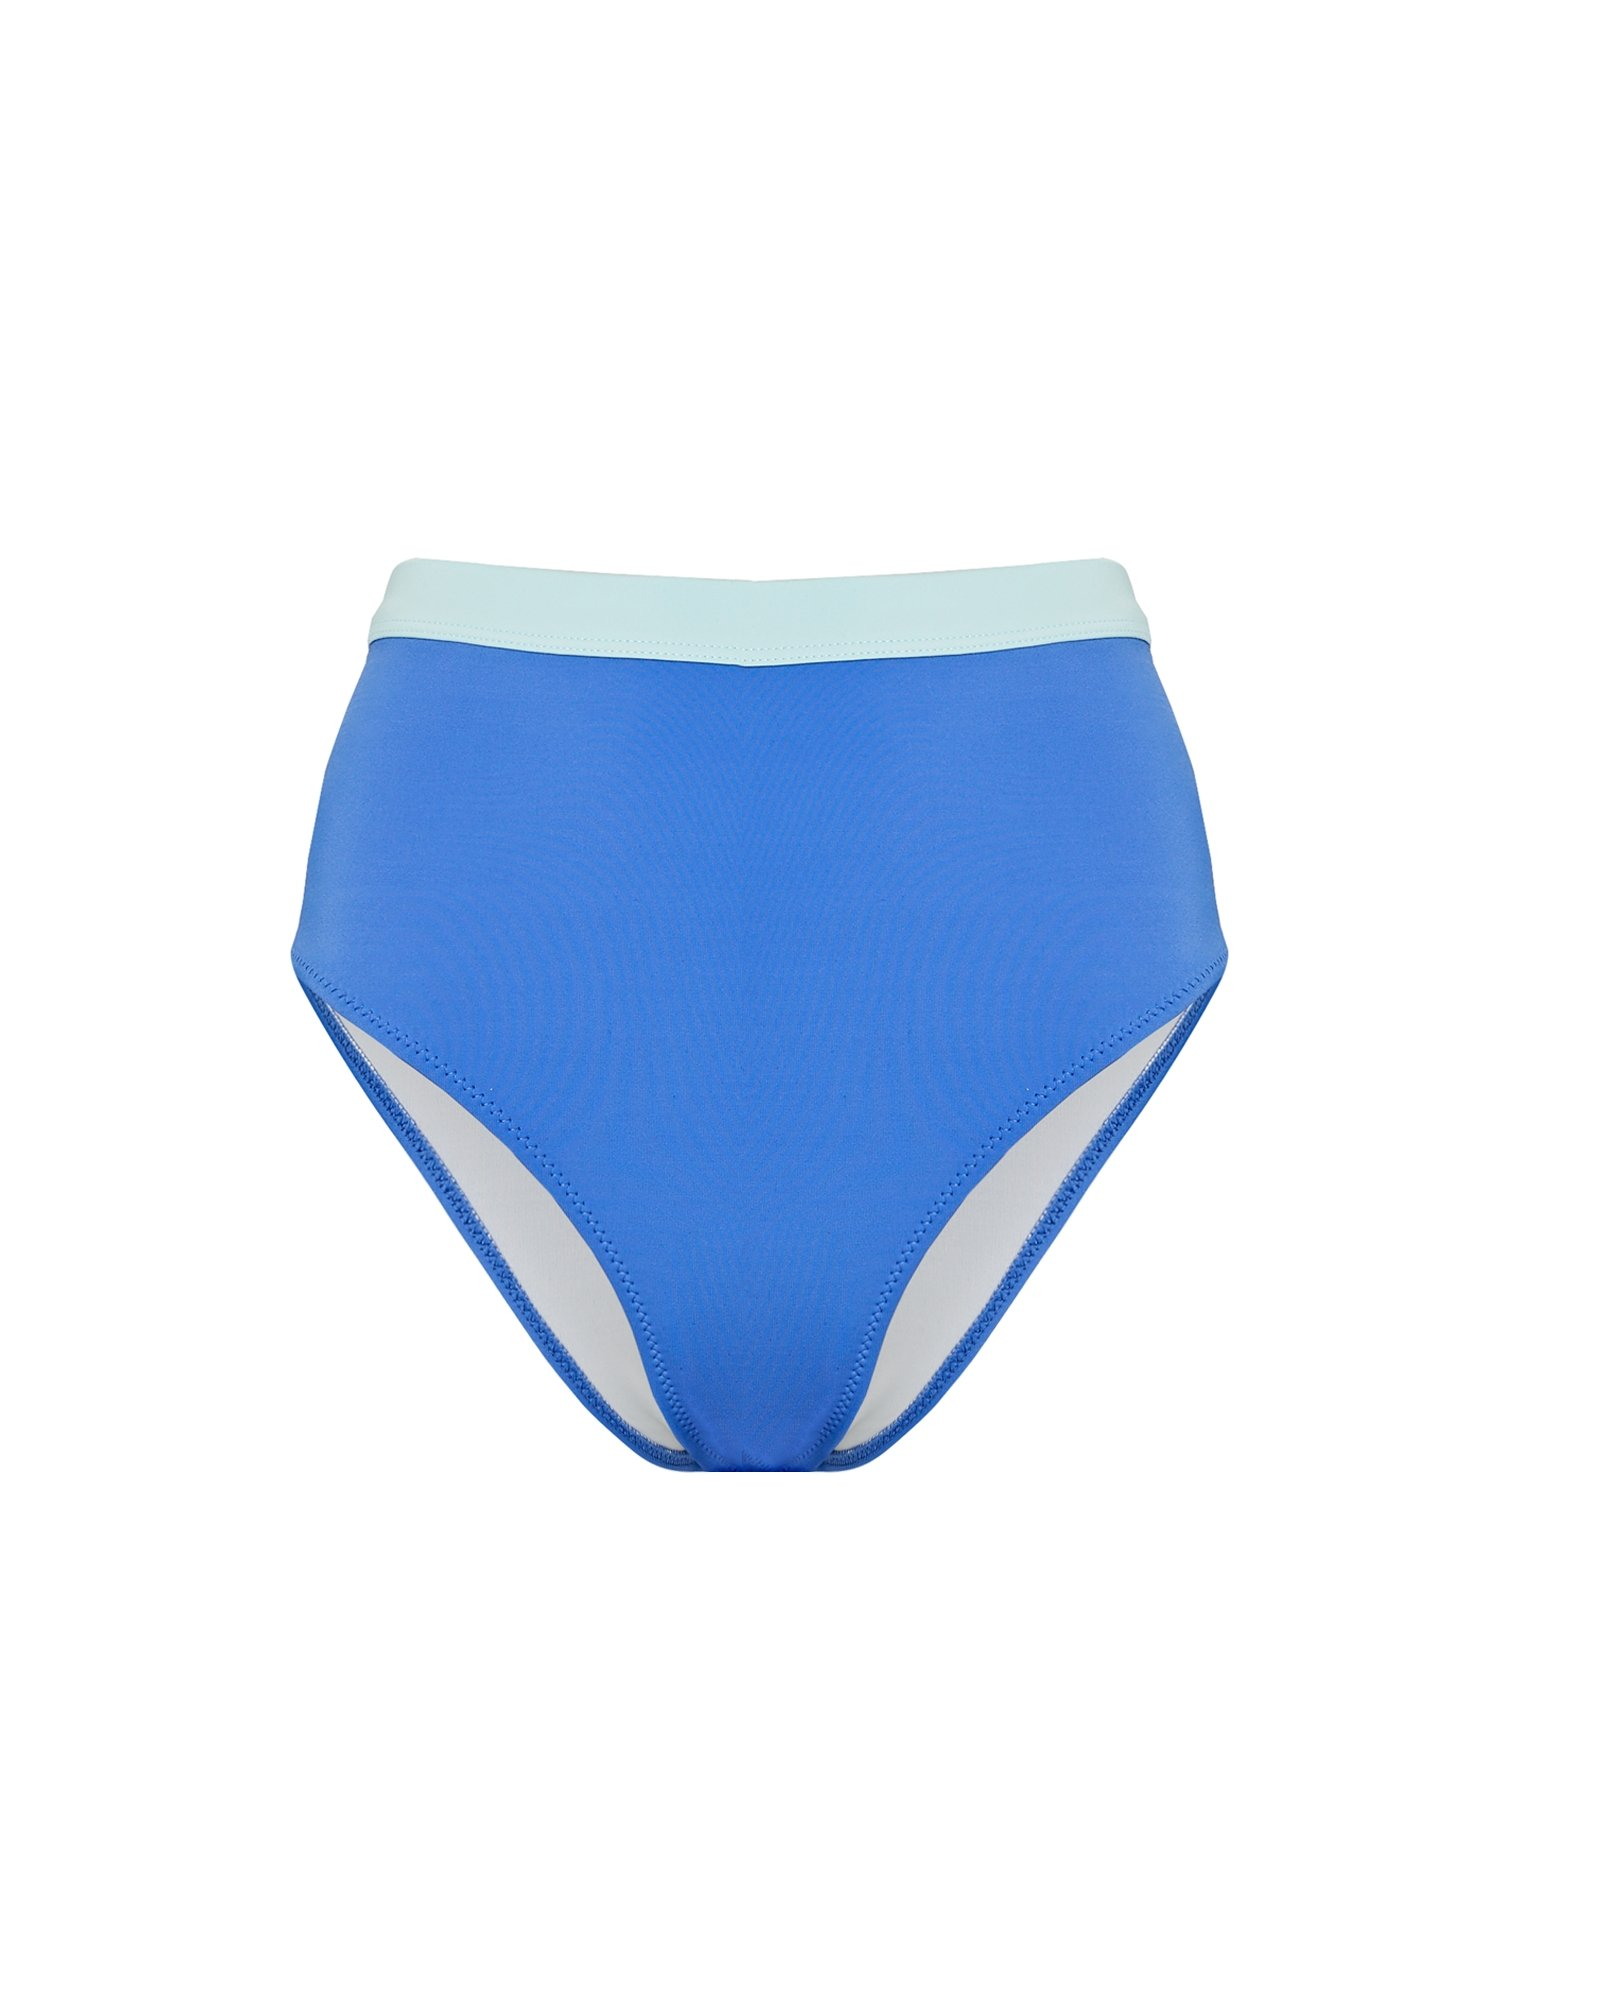 Solid & Striped Lilo High-Waist Bikini Bottoms